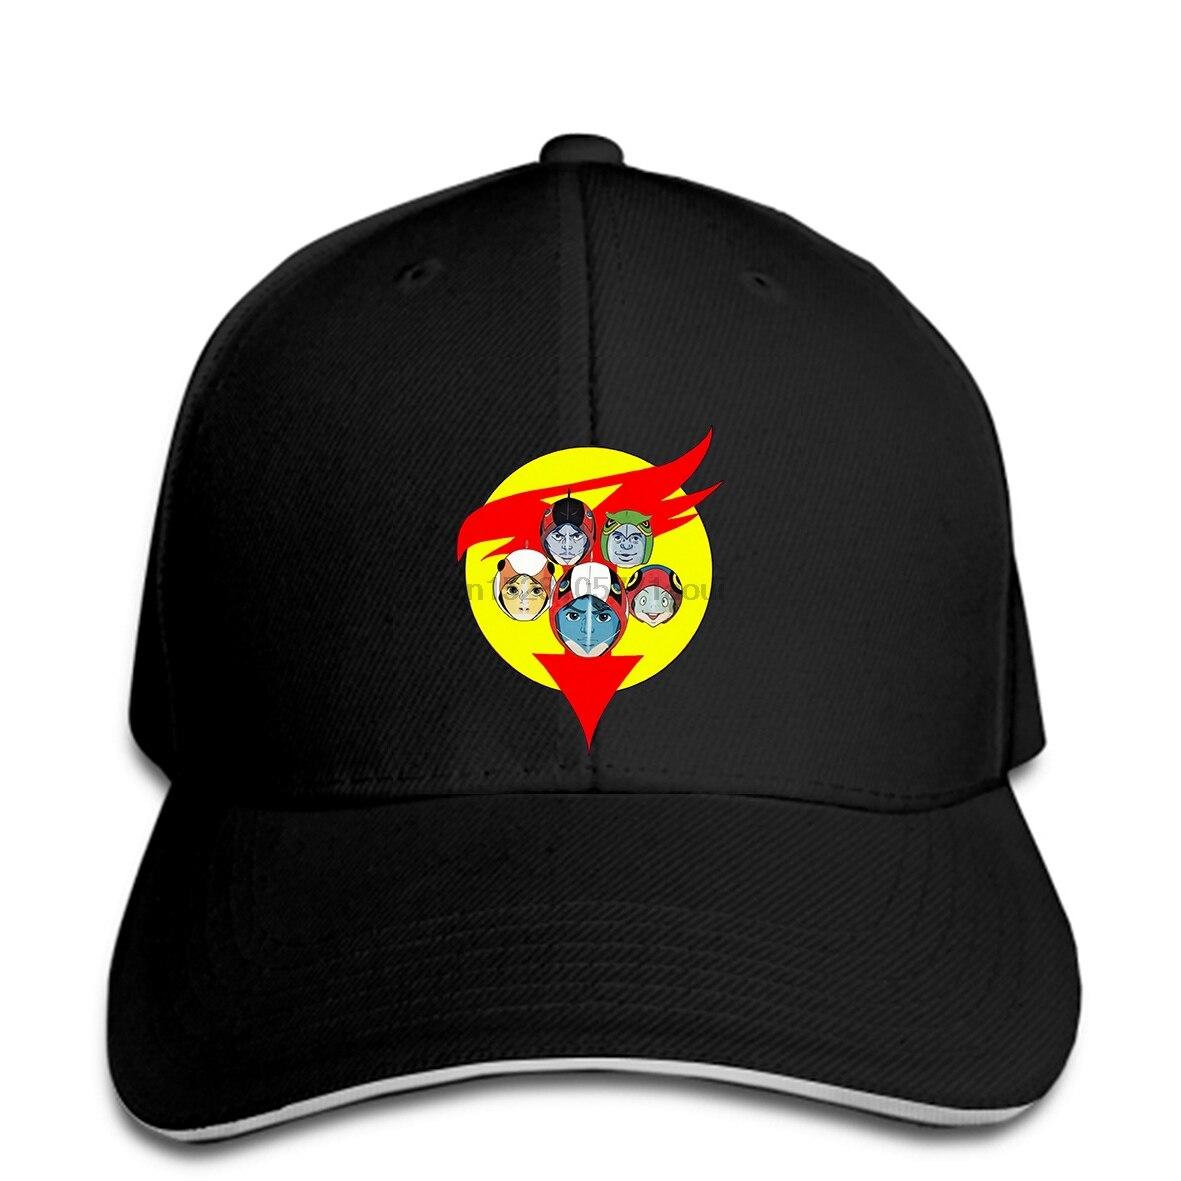 Baseball cap Printed Men Print hat snapbacks Battle of the Planets aka Gatchaman Team Women Baseball caps